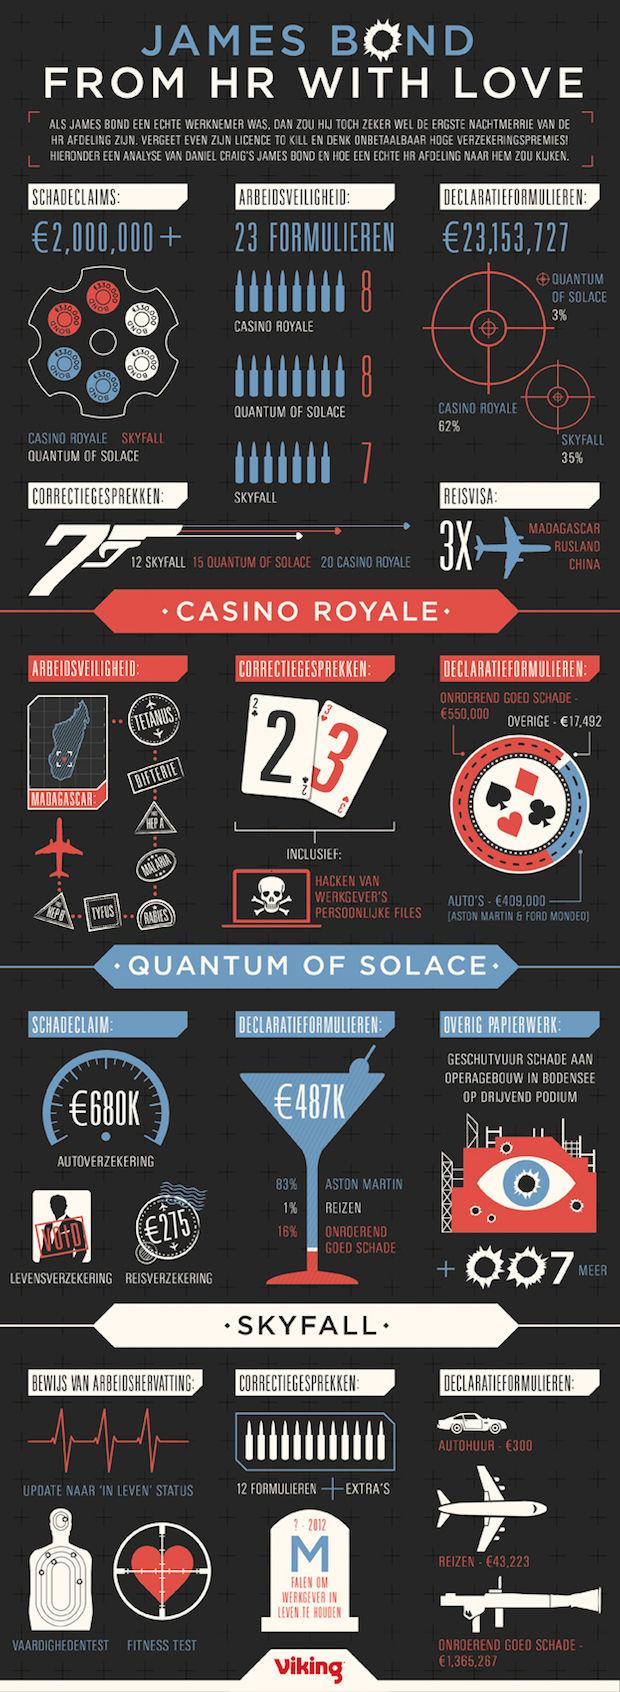 infographic_james_bond